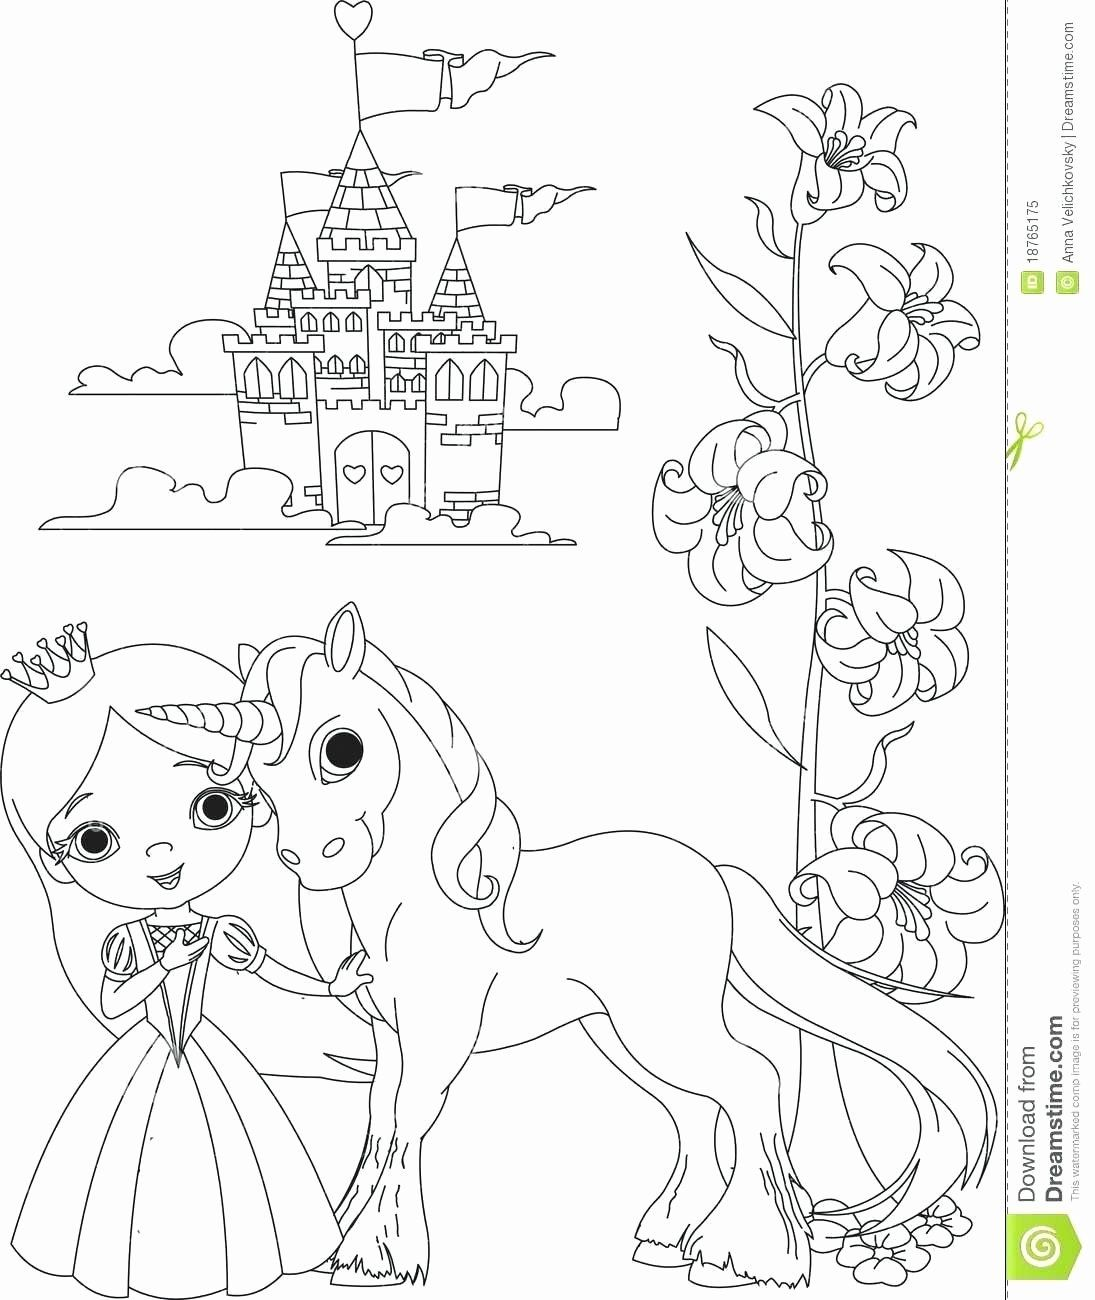 Unicorn Princess Coloring Page Beautiful Free Coloring Pictures Of Unicorns Nobelpaper Unicorn Coloring Pages Princess Coloring Pages Princess Coloring